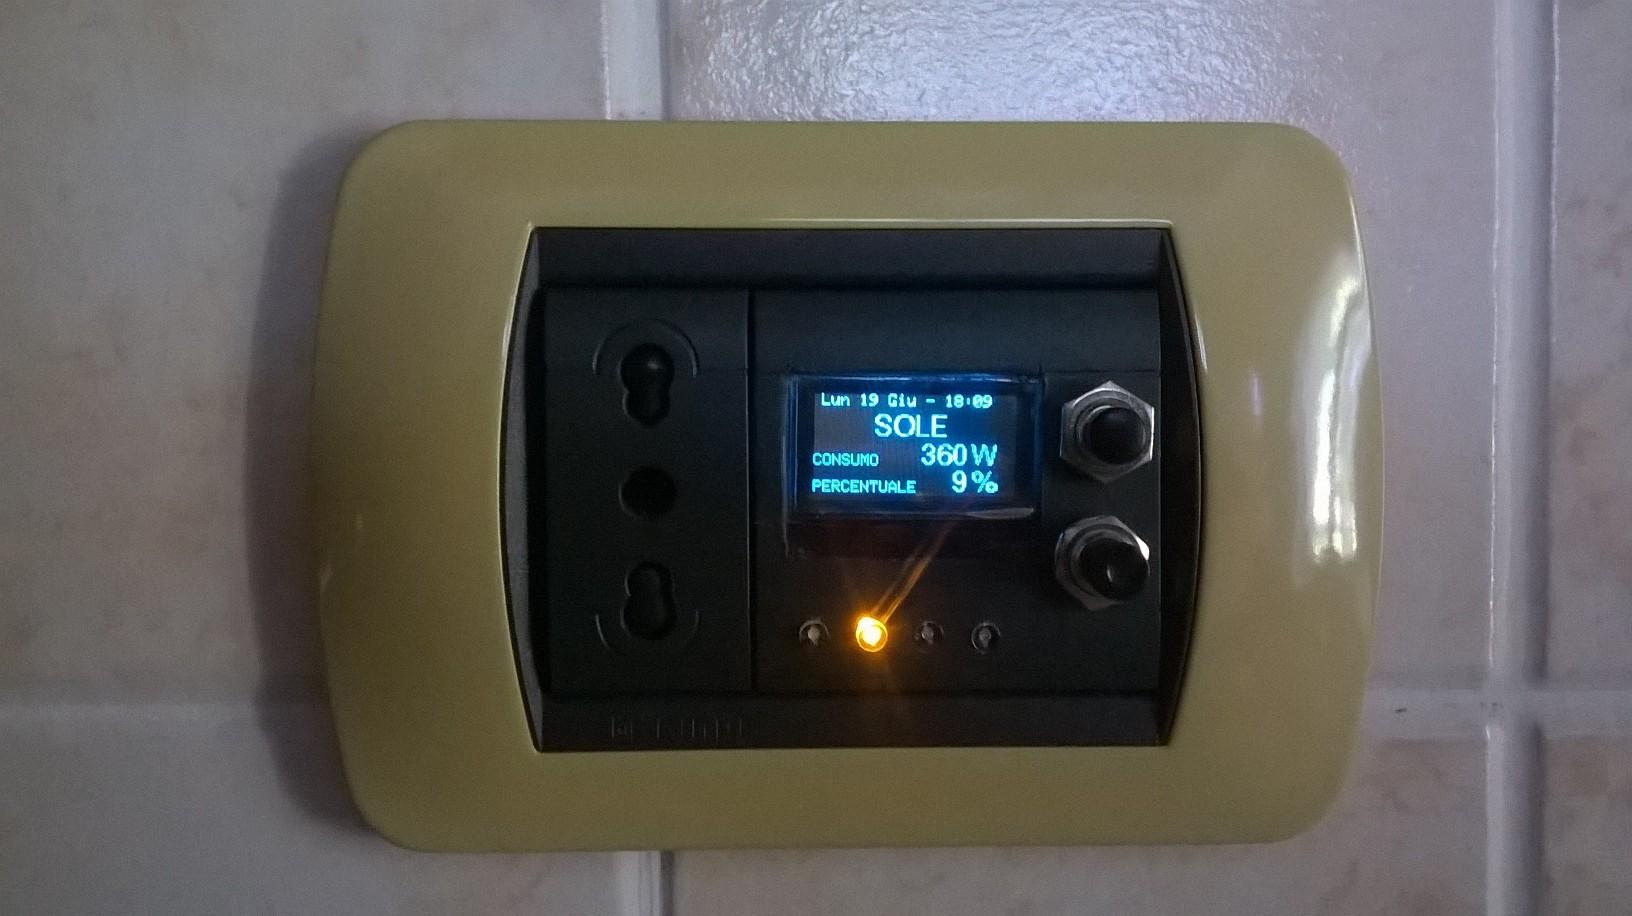 Frigorifero da incasso Rex ENN 2853 COW- pagina 6 - Elettrodomestici